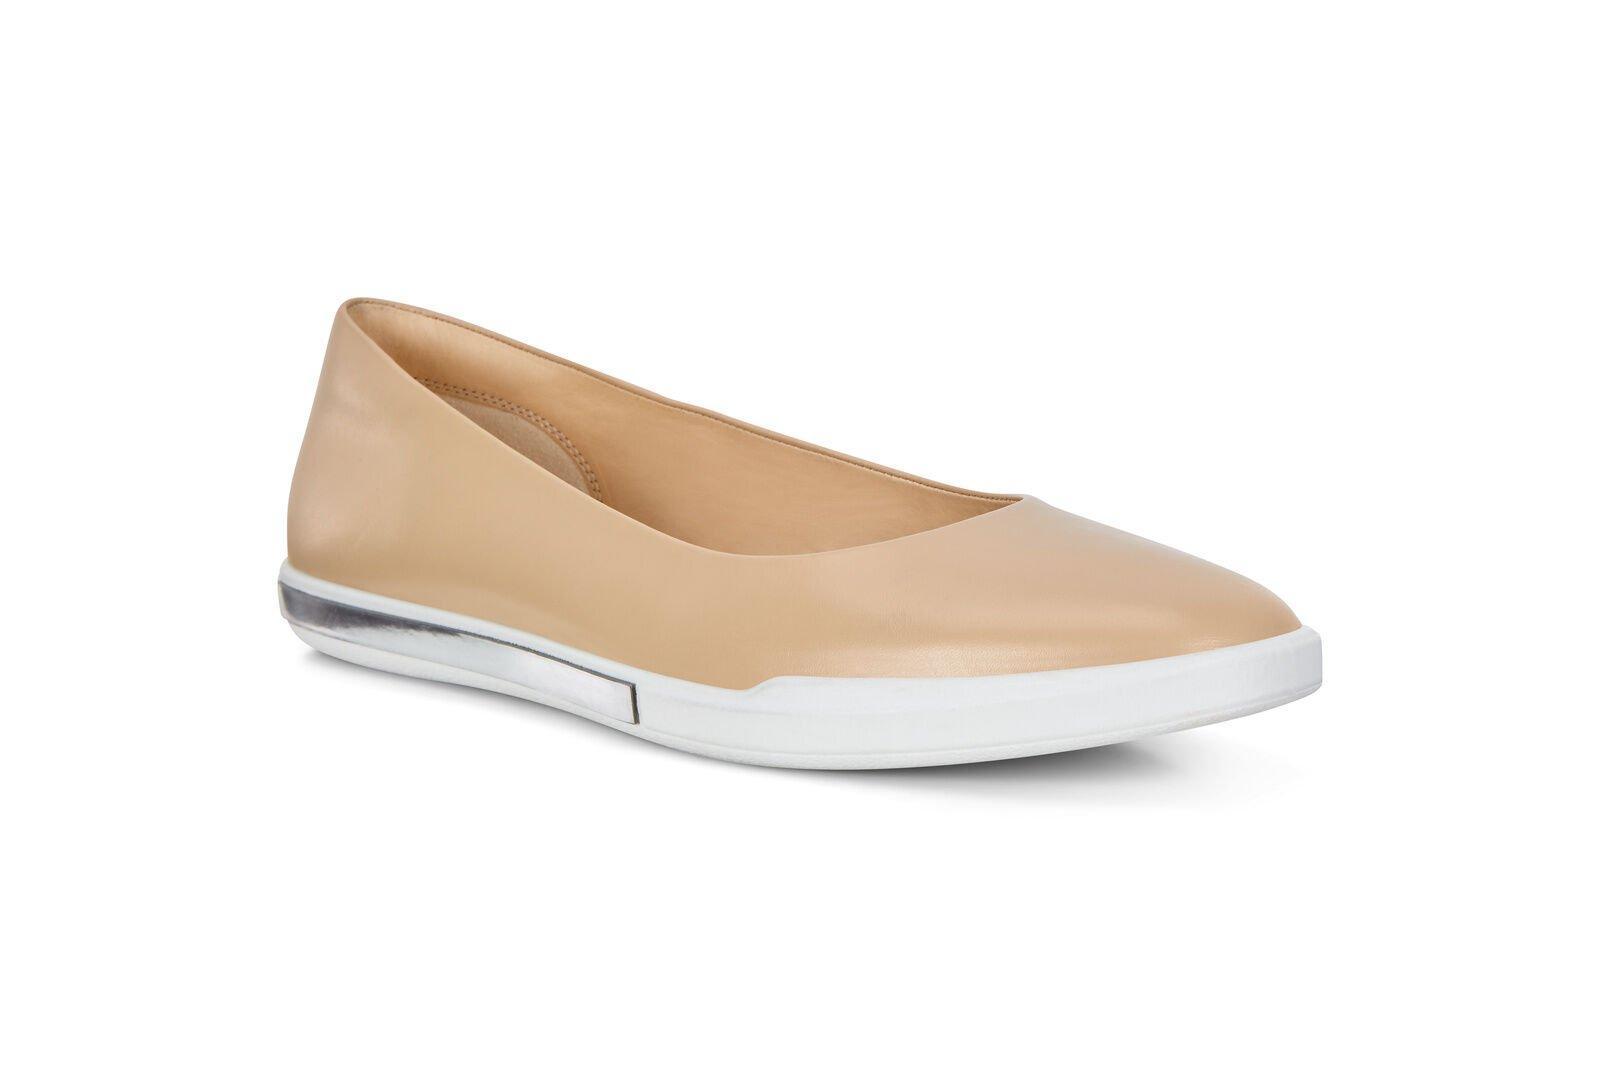 Ecco simpil WOMEN Chaussures Femmes Sneaker Cuir Basses Chaussure Lacée 208613